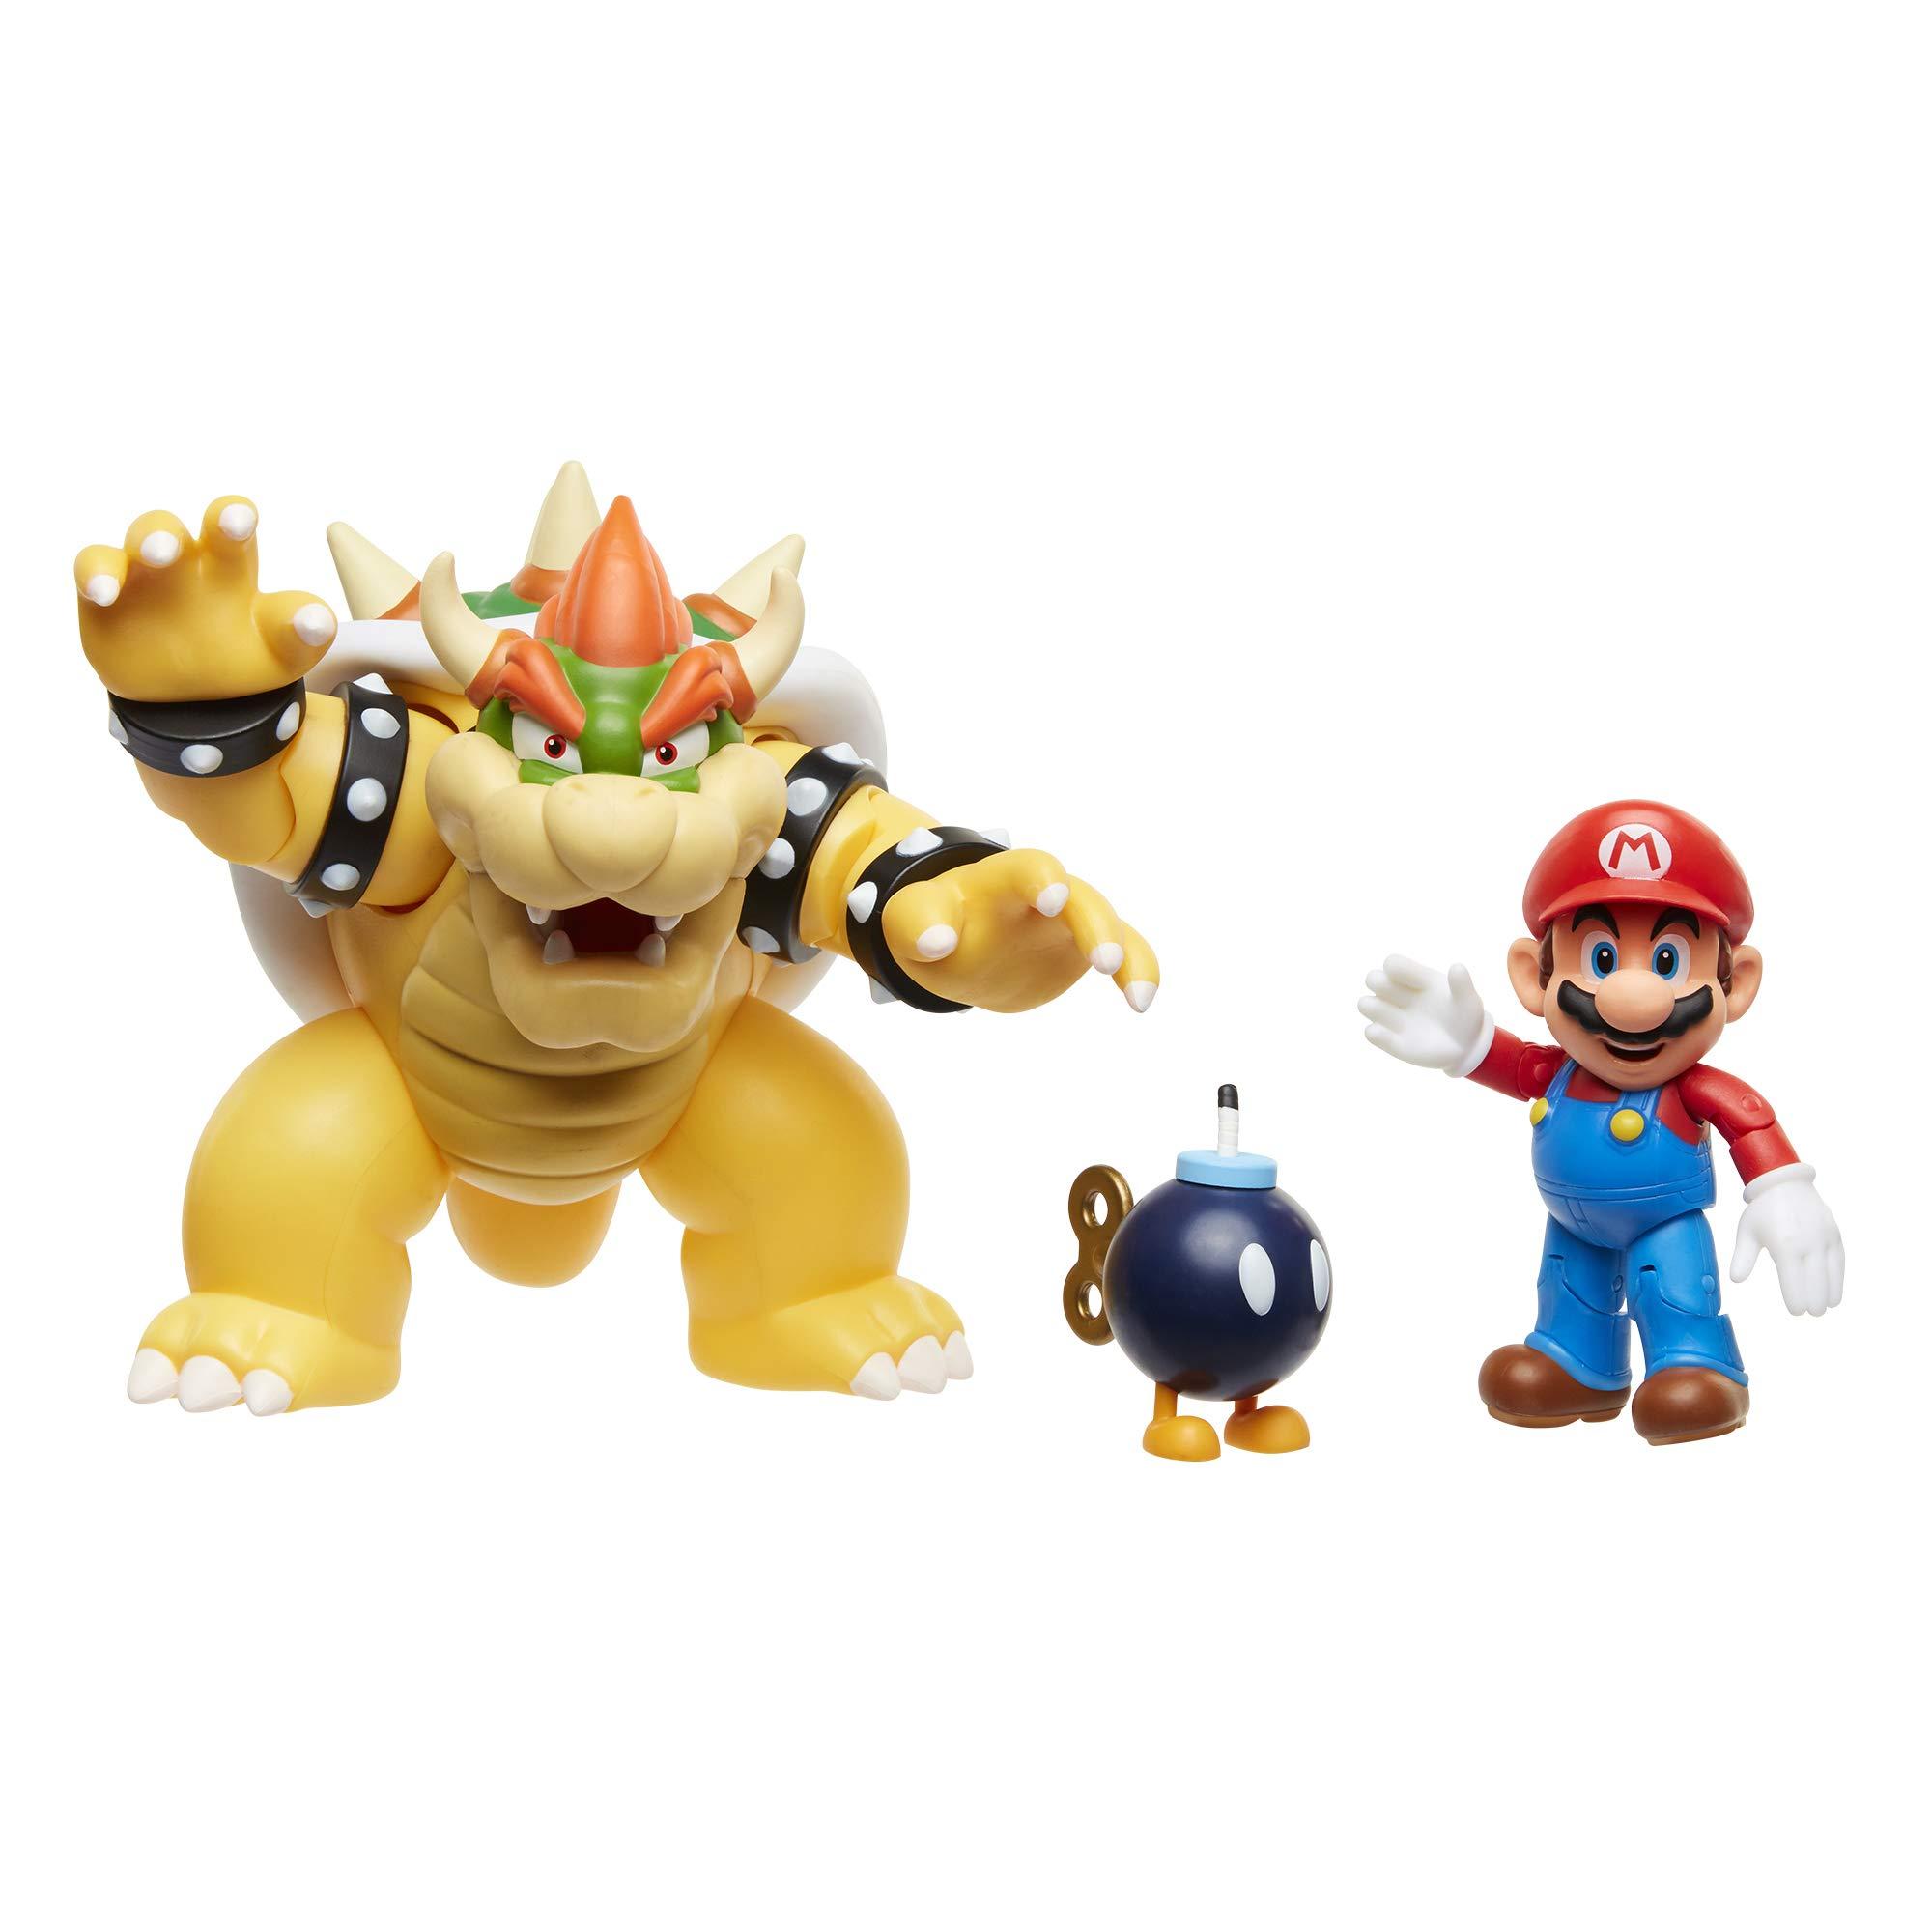 Nintendo Super Mario Bowser Vs Mario Diorama Figure 3 Pack by Nintendo (Image #4)